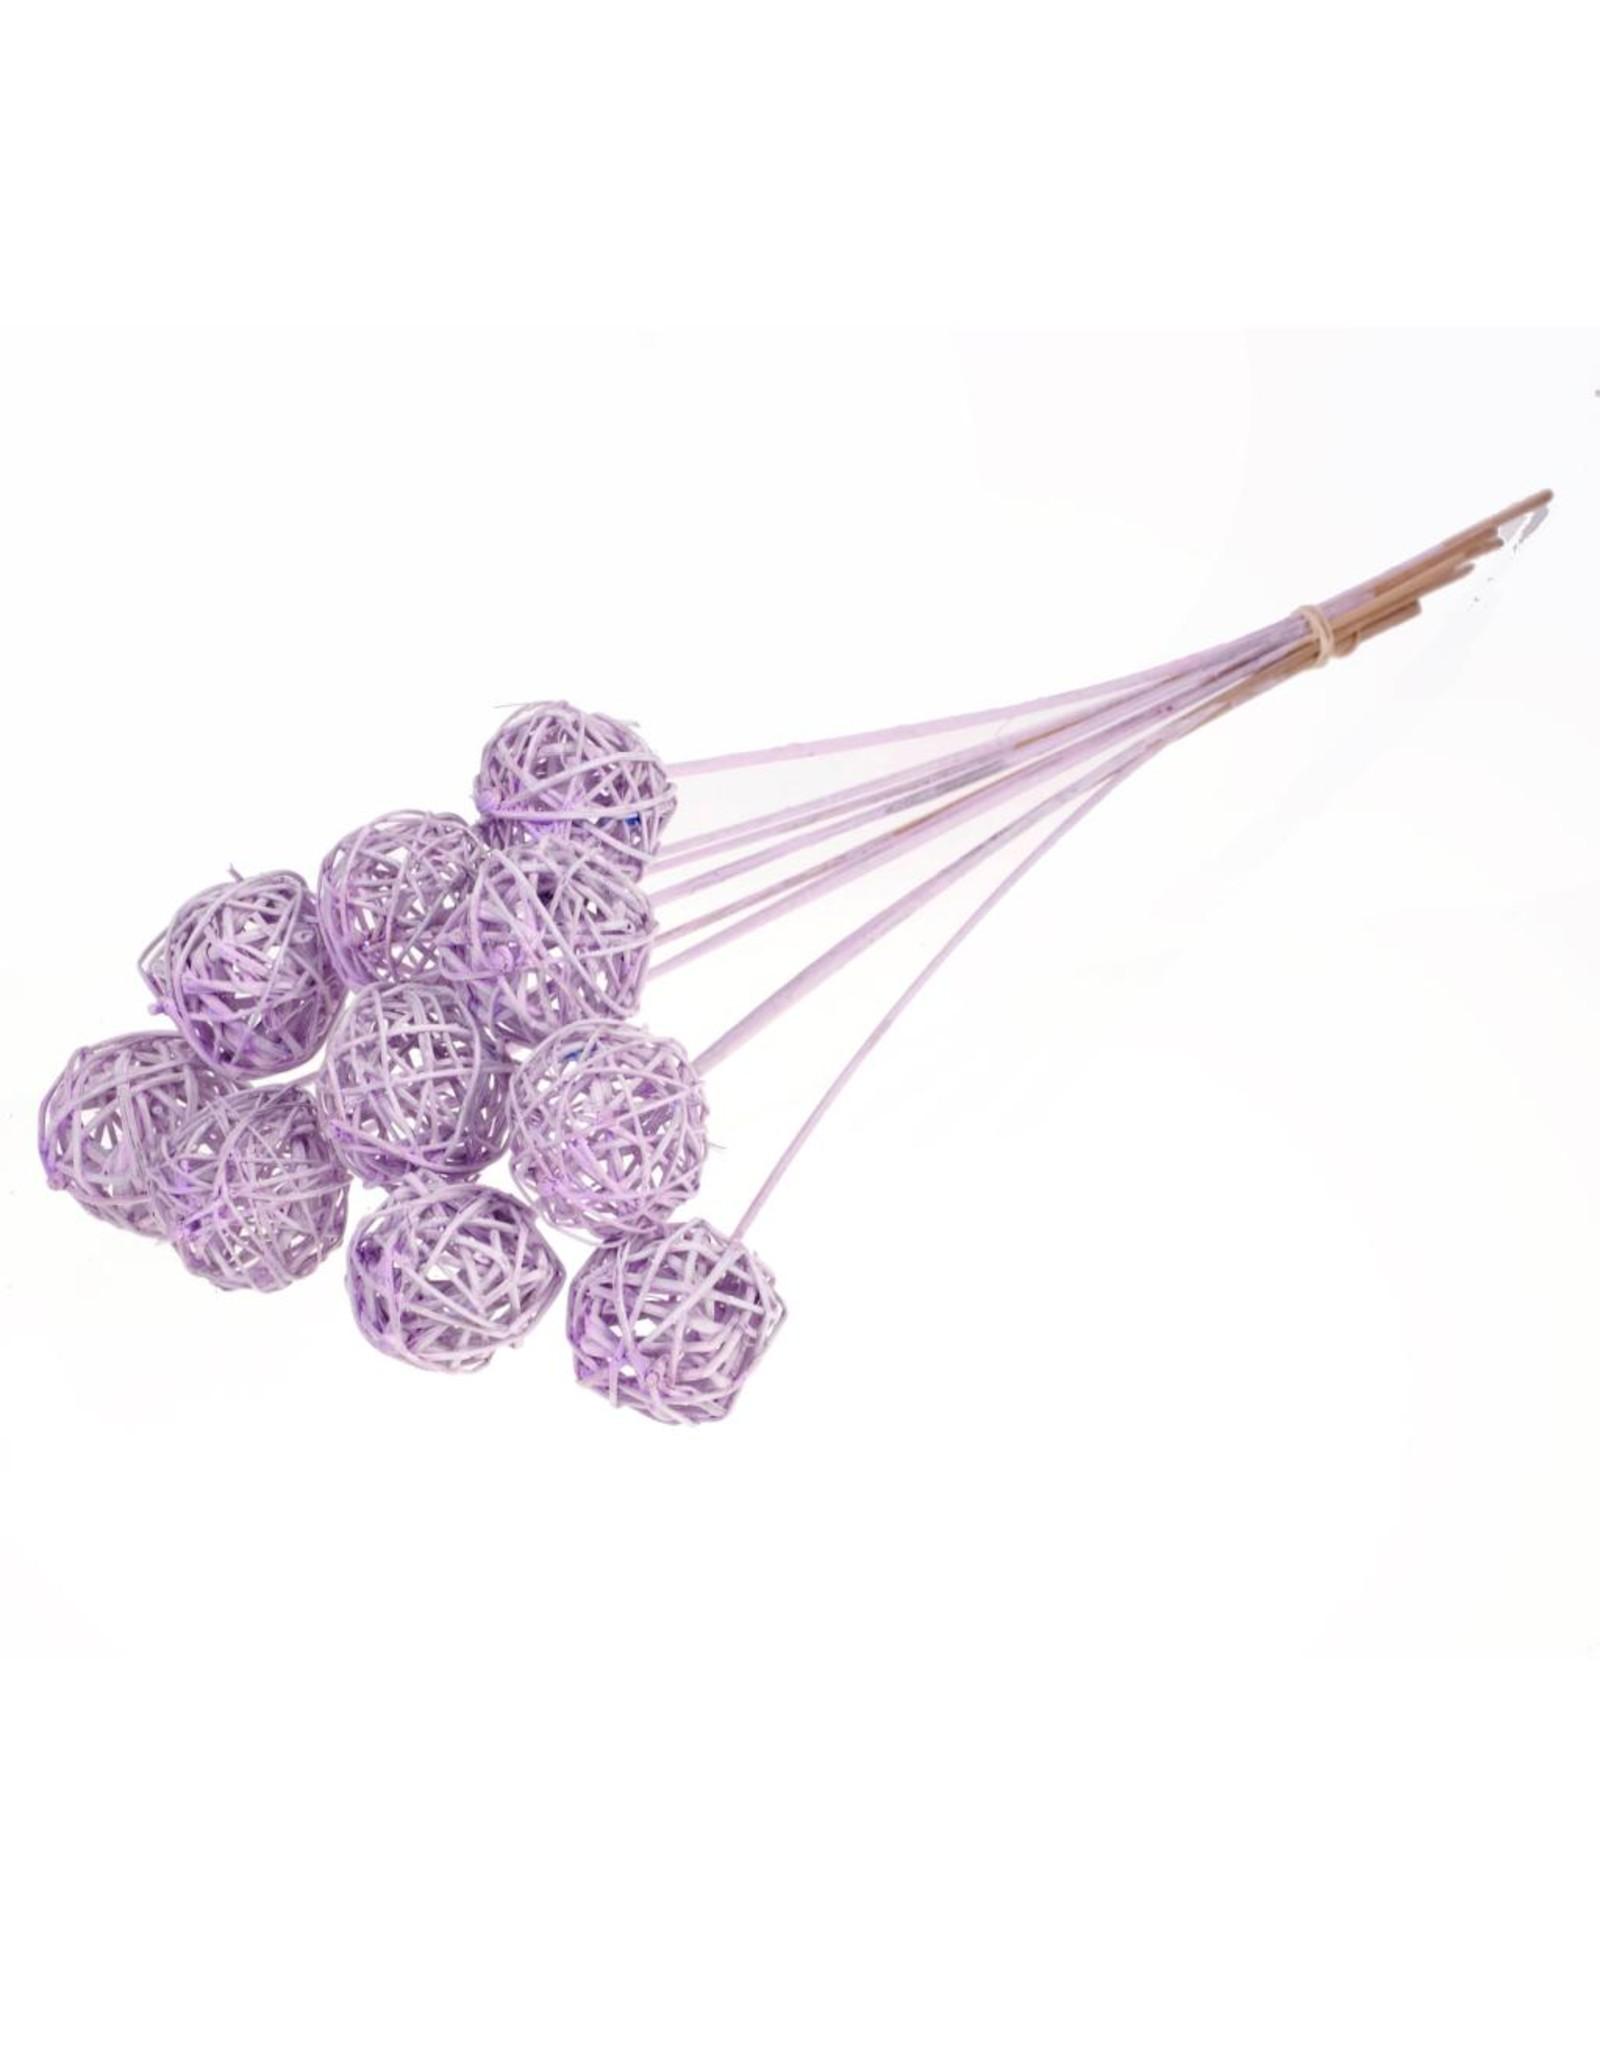 Brunch ball 5cm o/s 10pc lilac misty x 15